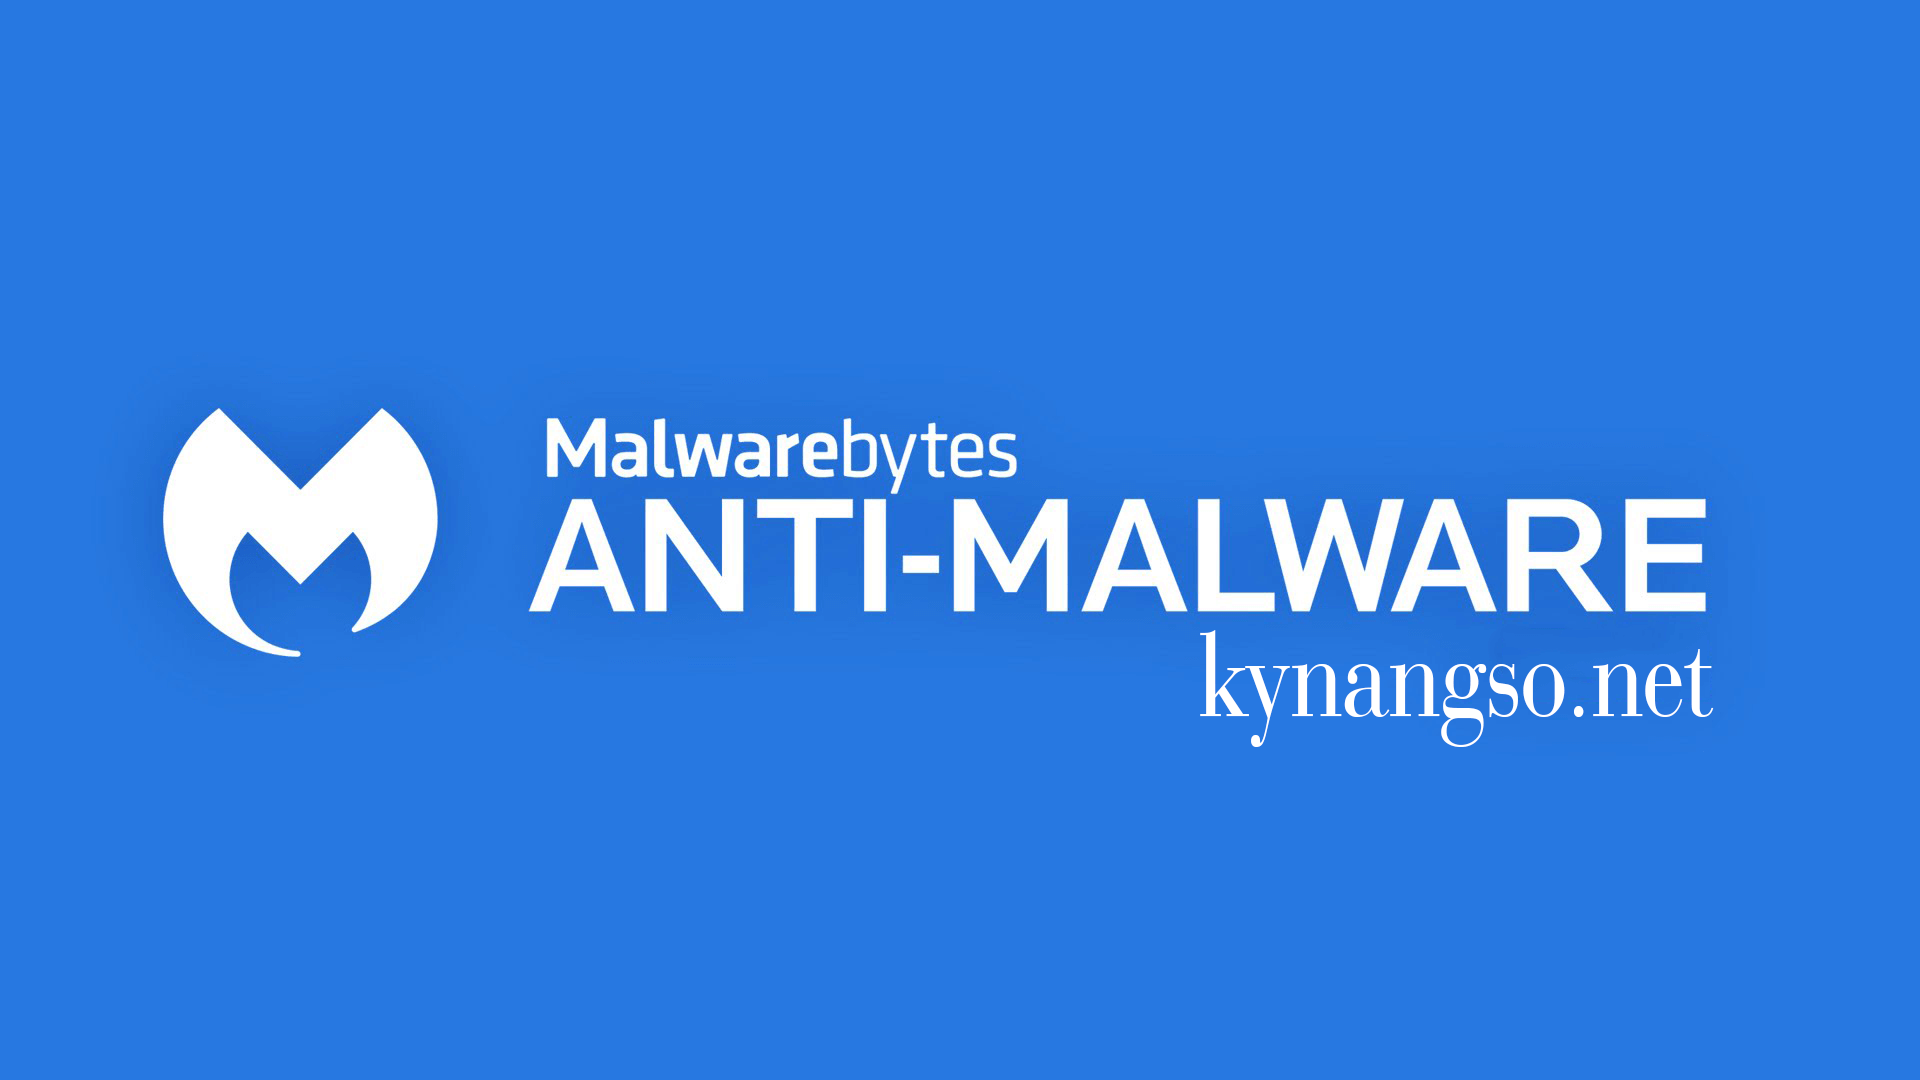 Antivirus Malwarebytes 2018 Phần mềm diệt virus và Malware Cực hiệu quả 375x195 - Antivirus Malwarebytes 2018 - Phần mềm diệt virus và Malware Cực hiệu quả (Full KEY 18/10/2018)